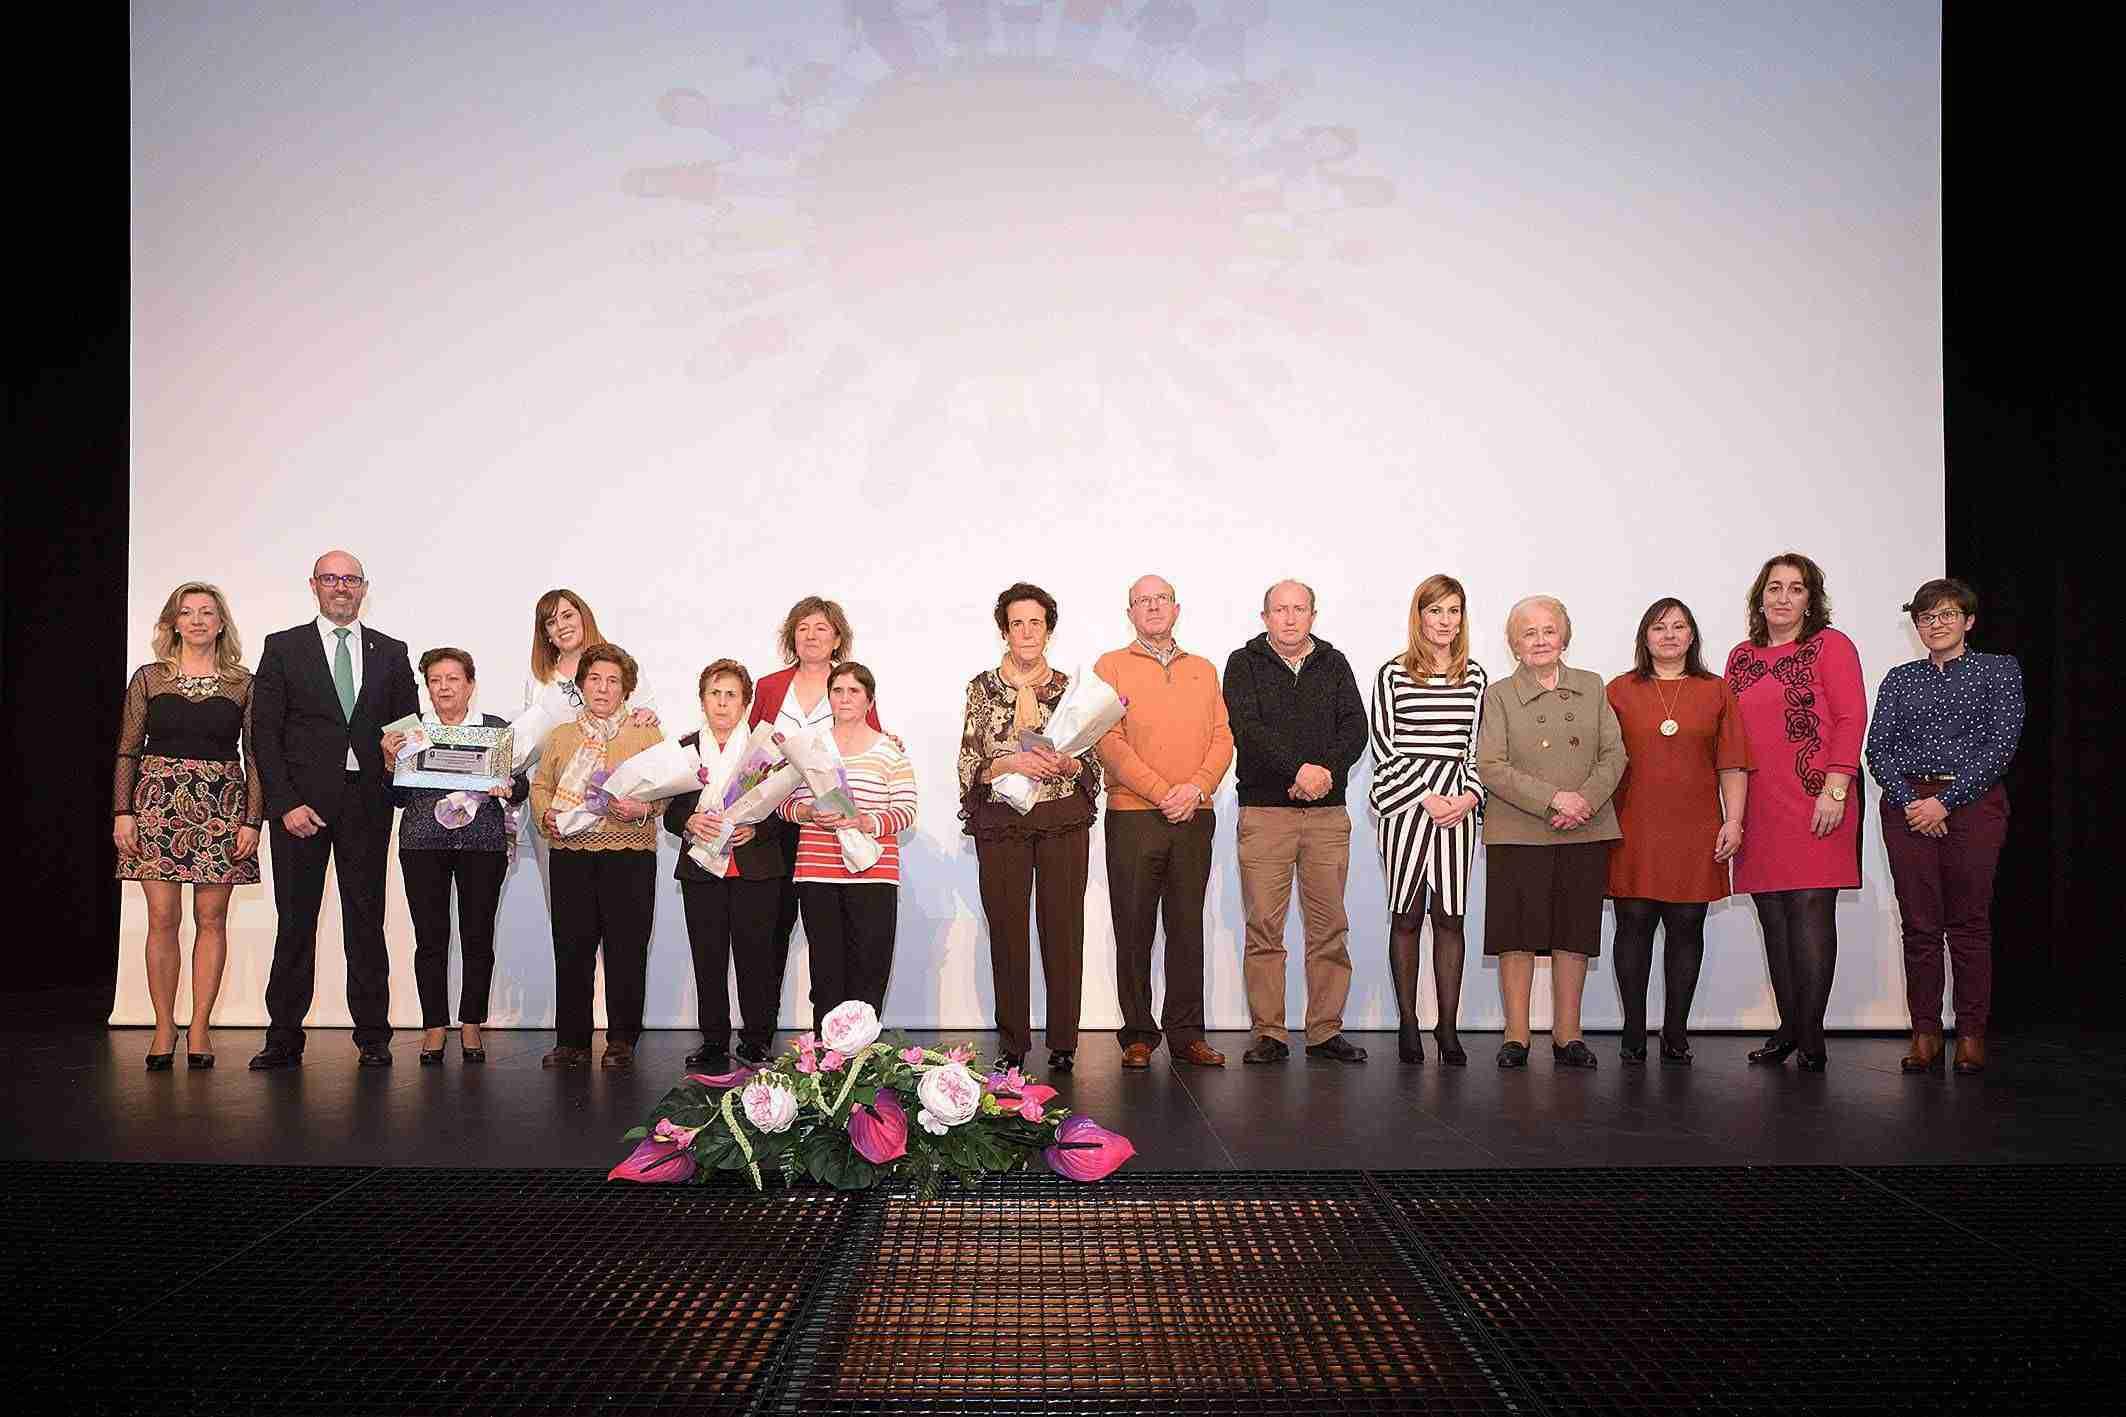 20180311_Acto Institu Dia Mujer_homenajeadas_AdeAlba 1